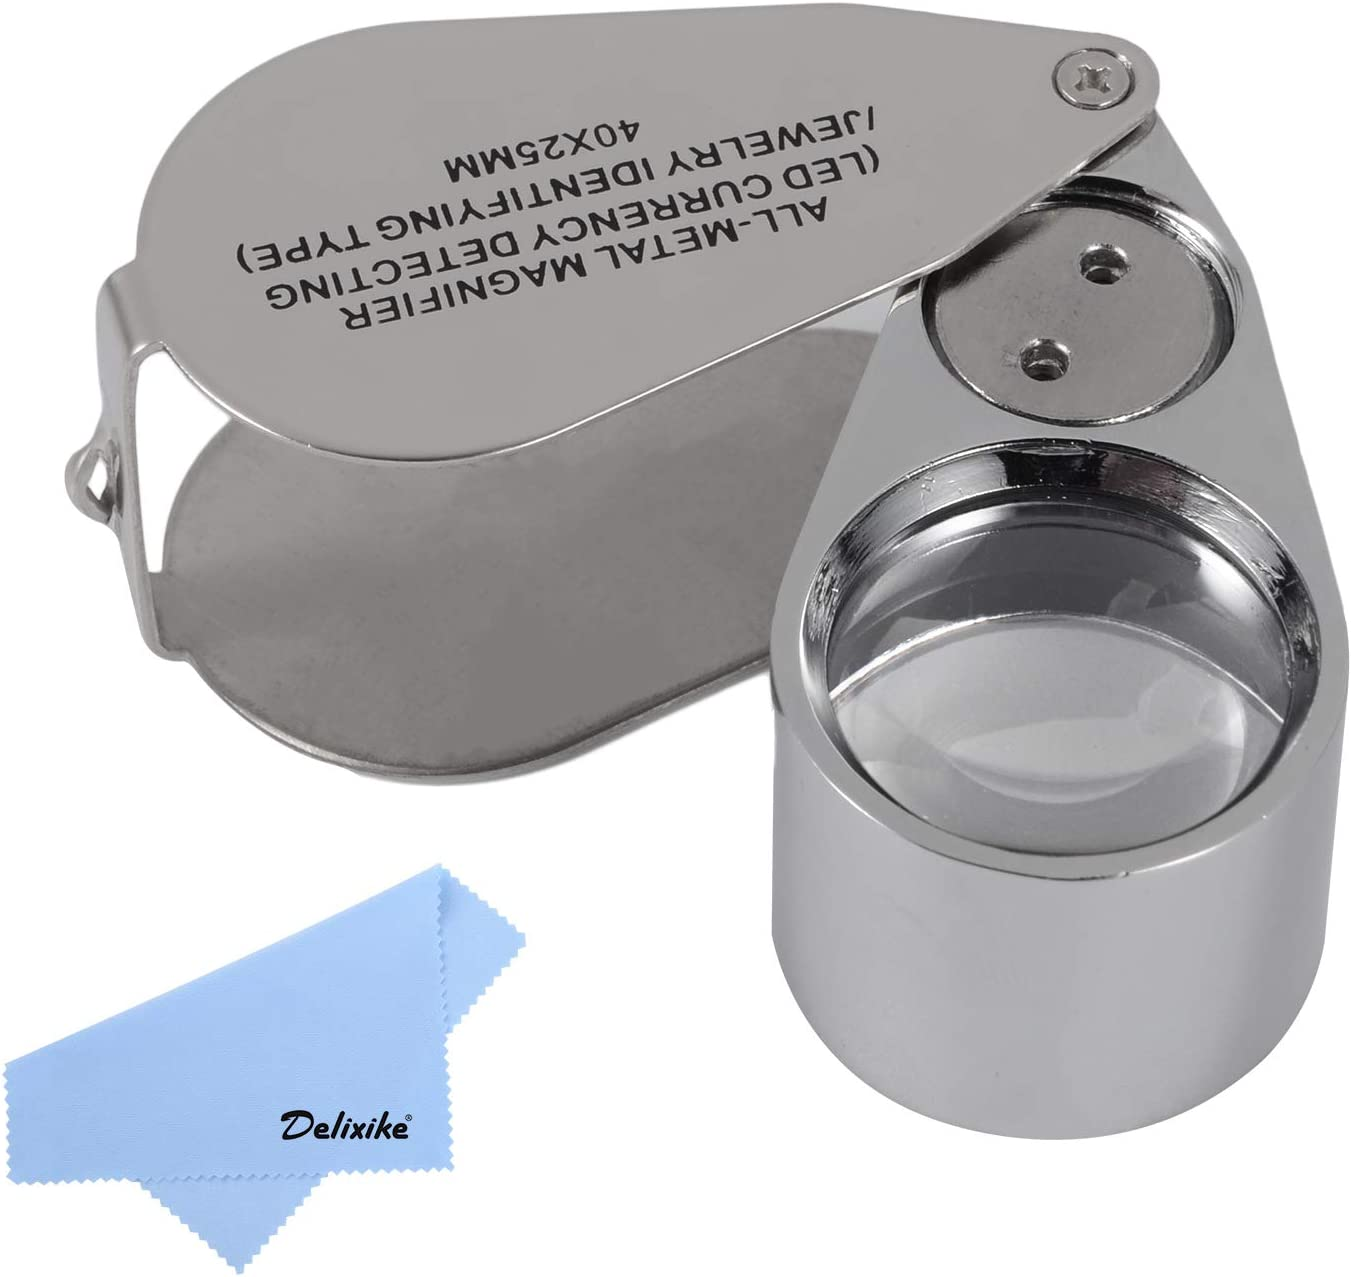 40X Popular standard Full Metal Illuminated 25% OFF Jewelry Pocke Loop Delixike Magnifier